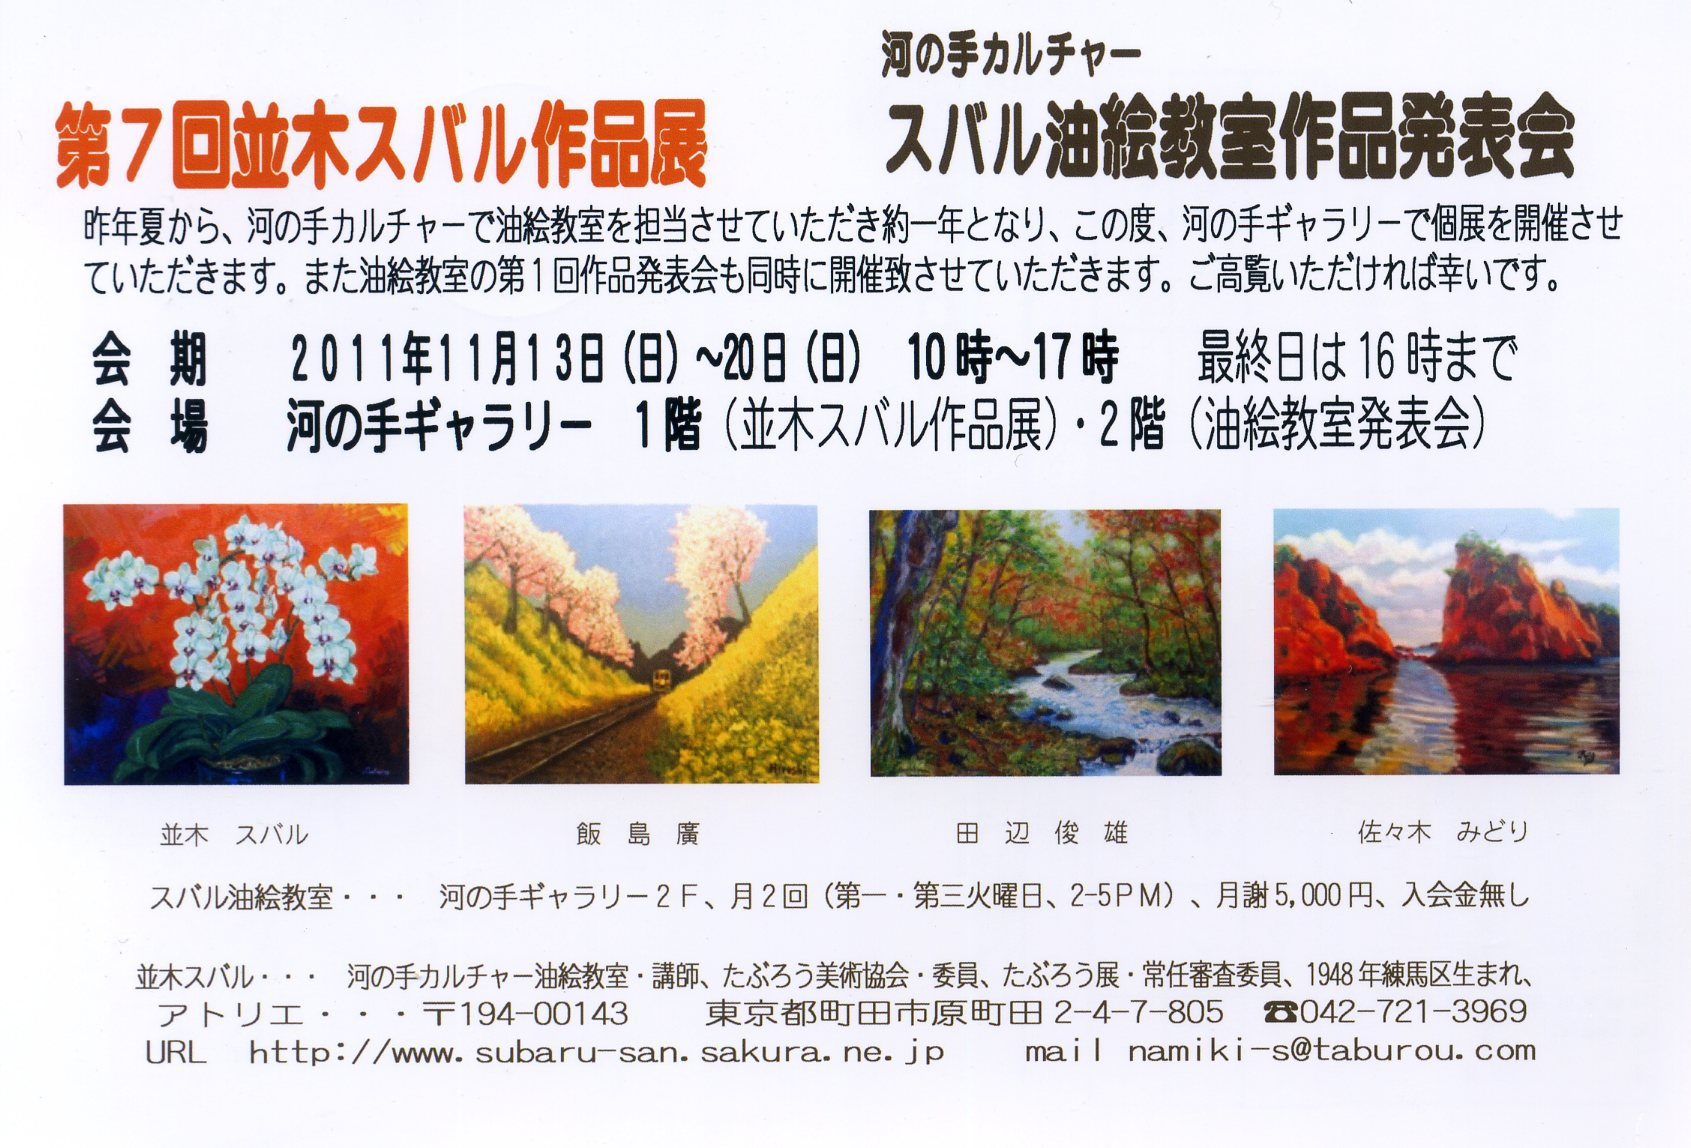 第7回並木スバル作品展 スバル油絵教室作品発表会_a0086270_811546.jpg